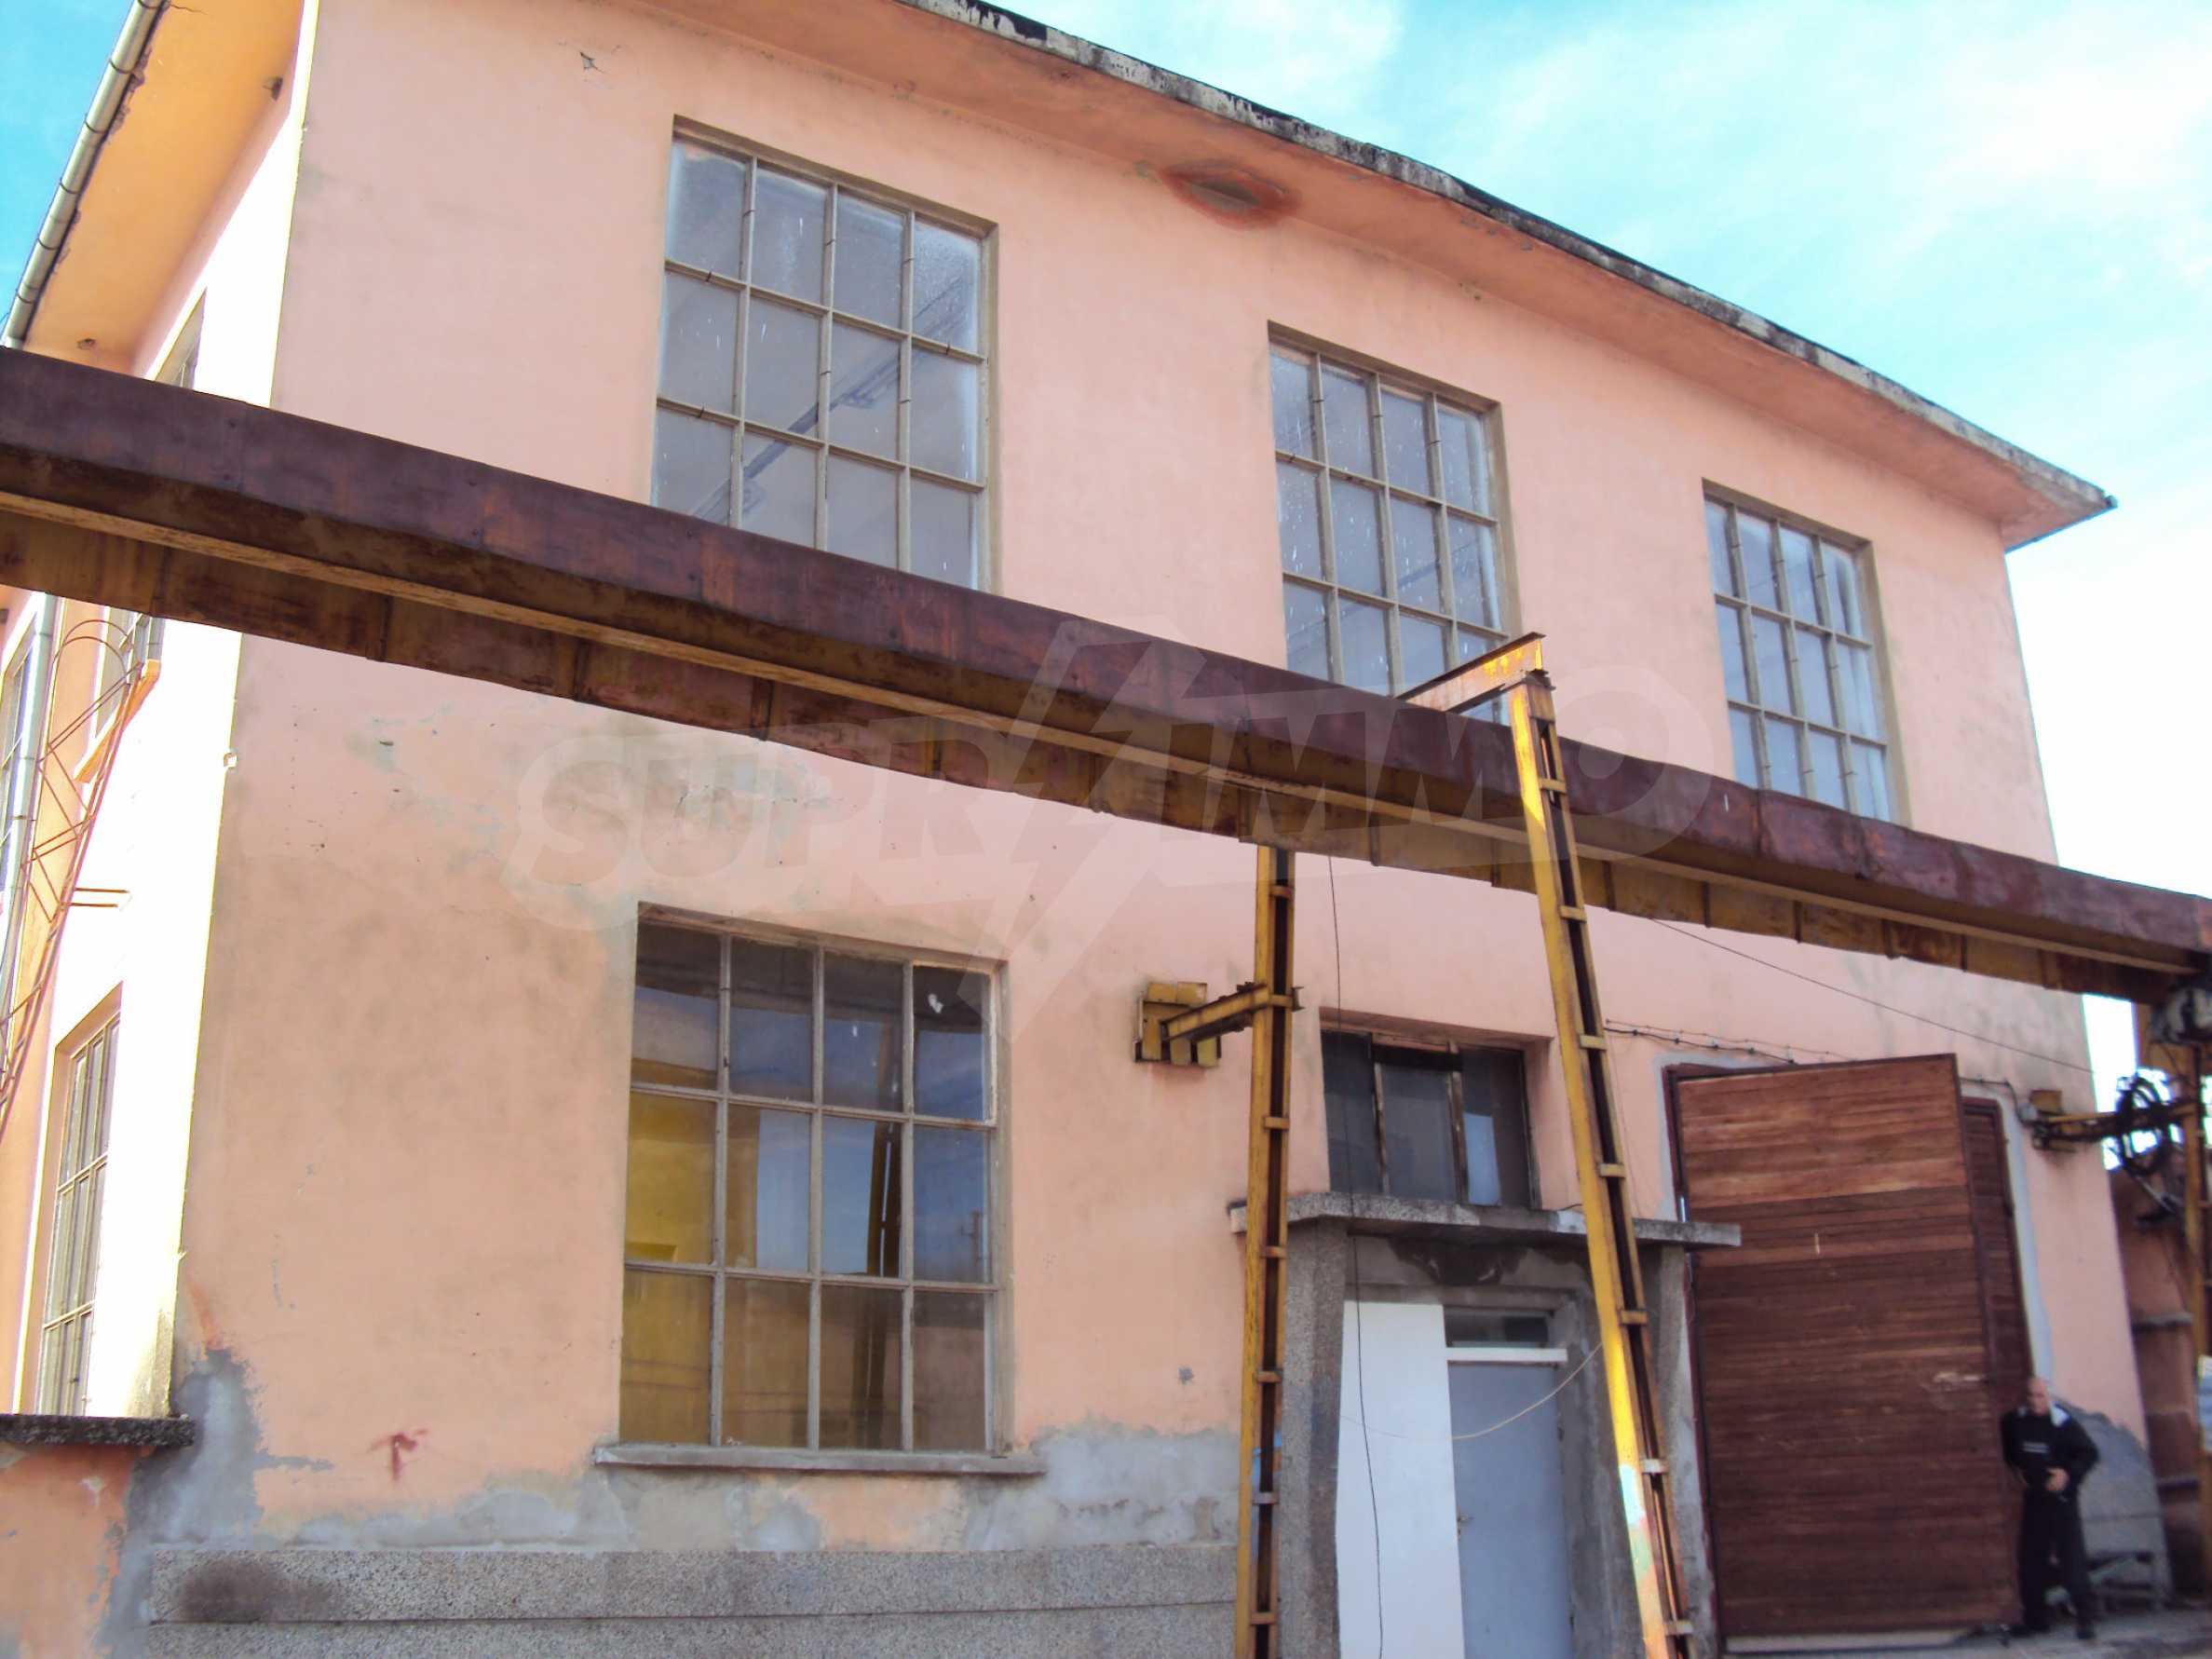 Fabrik in der Nähe von Veliko Tarnovo 28